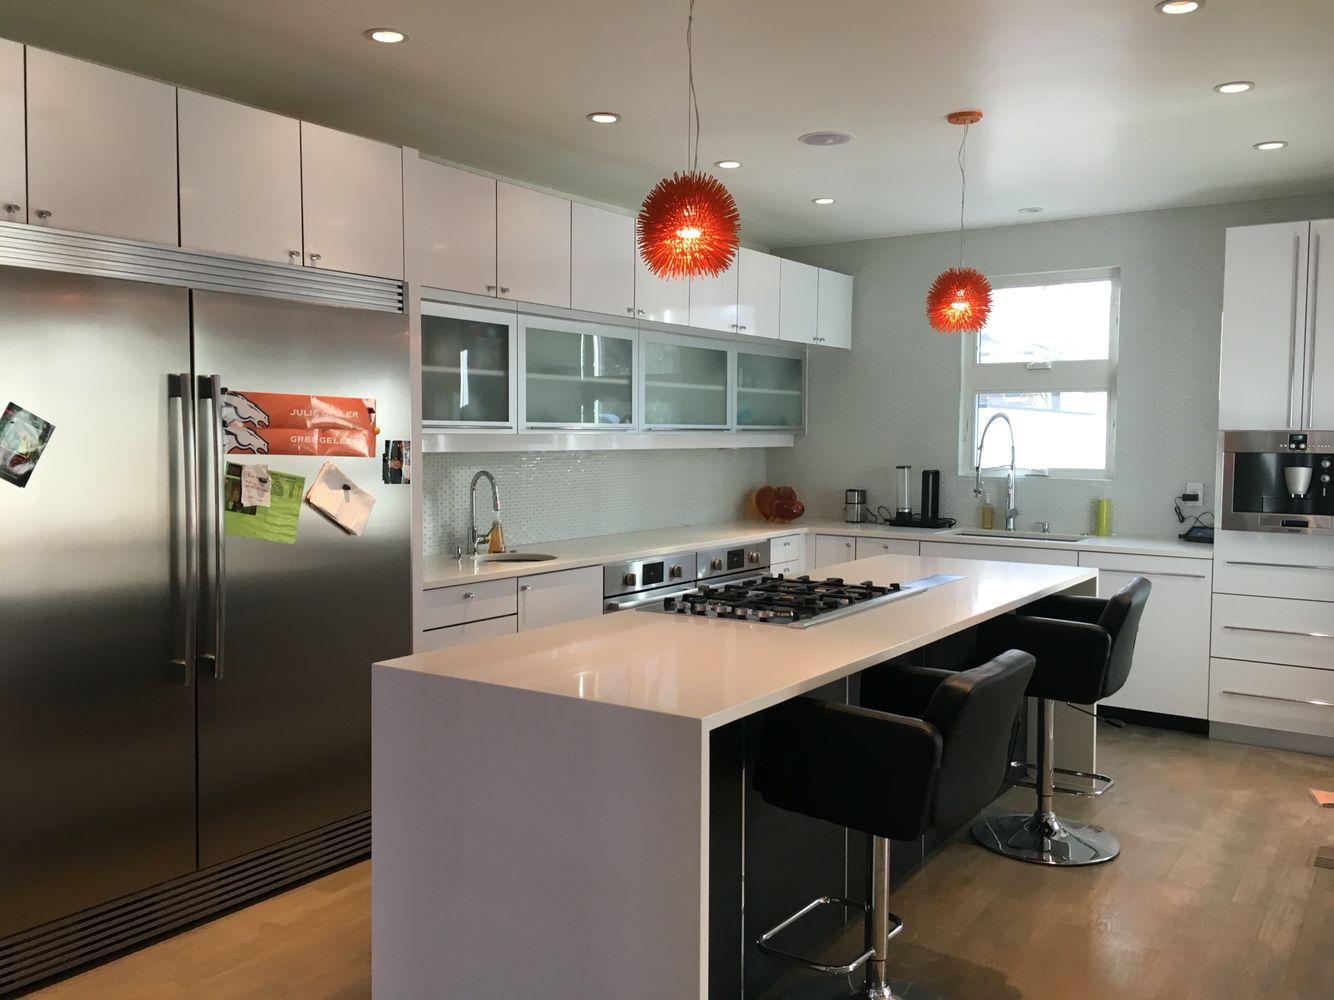 Modern kitchen with Bosch appliances - oversized fridge , double oven , double sink , island ...